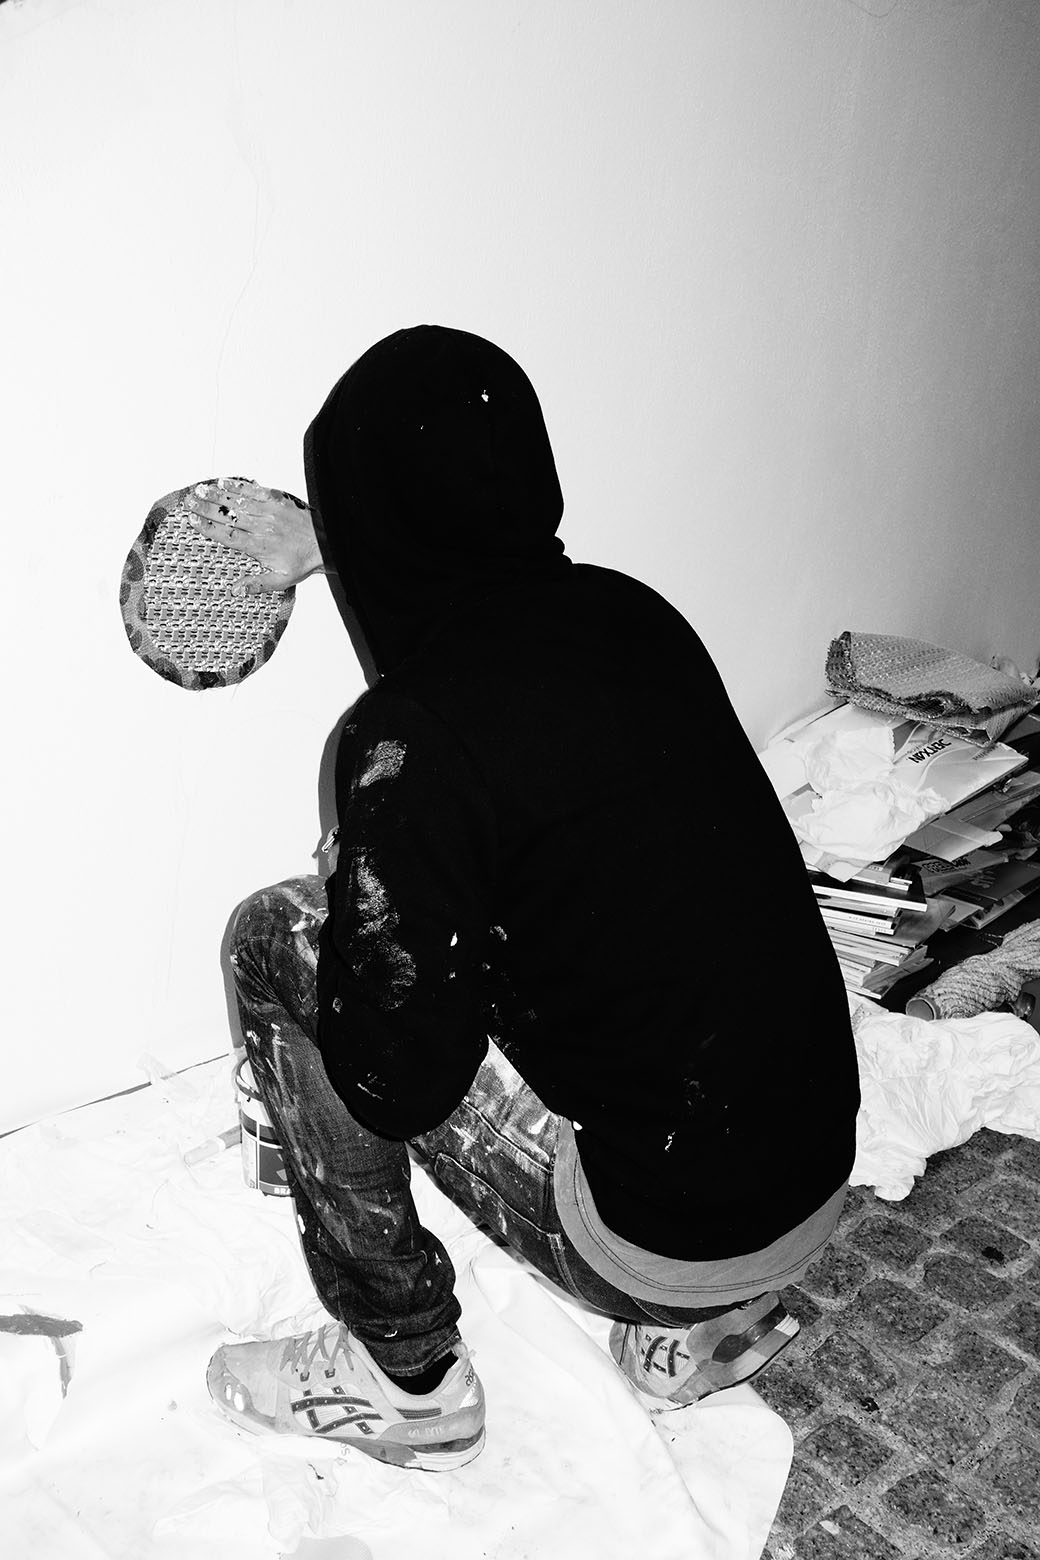 "<a href=""http://www.ivangrianti.com/"" target=""_blank"">Foto Ivan Grianti</a>"